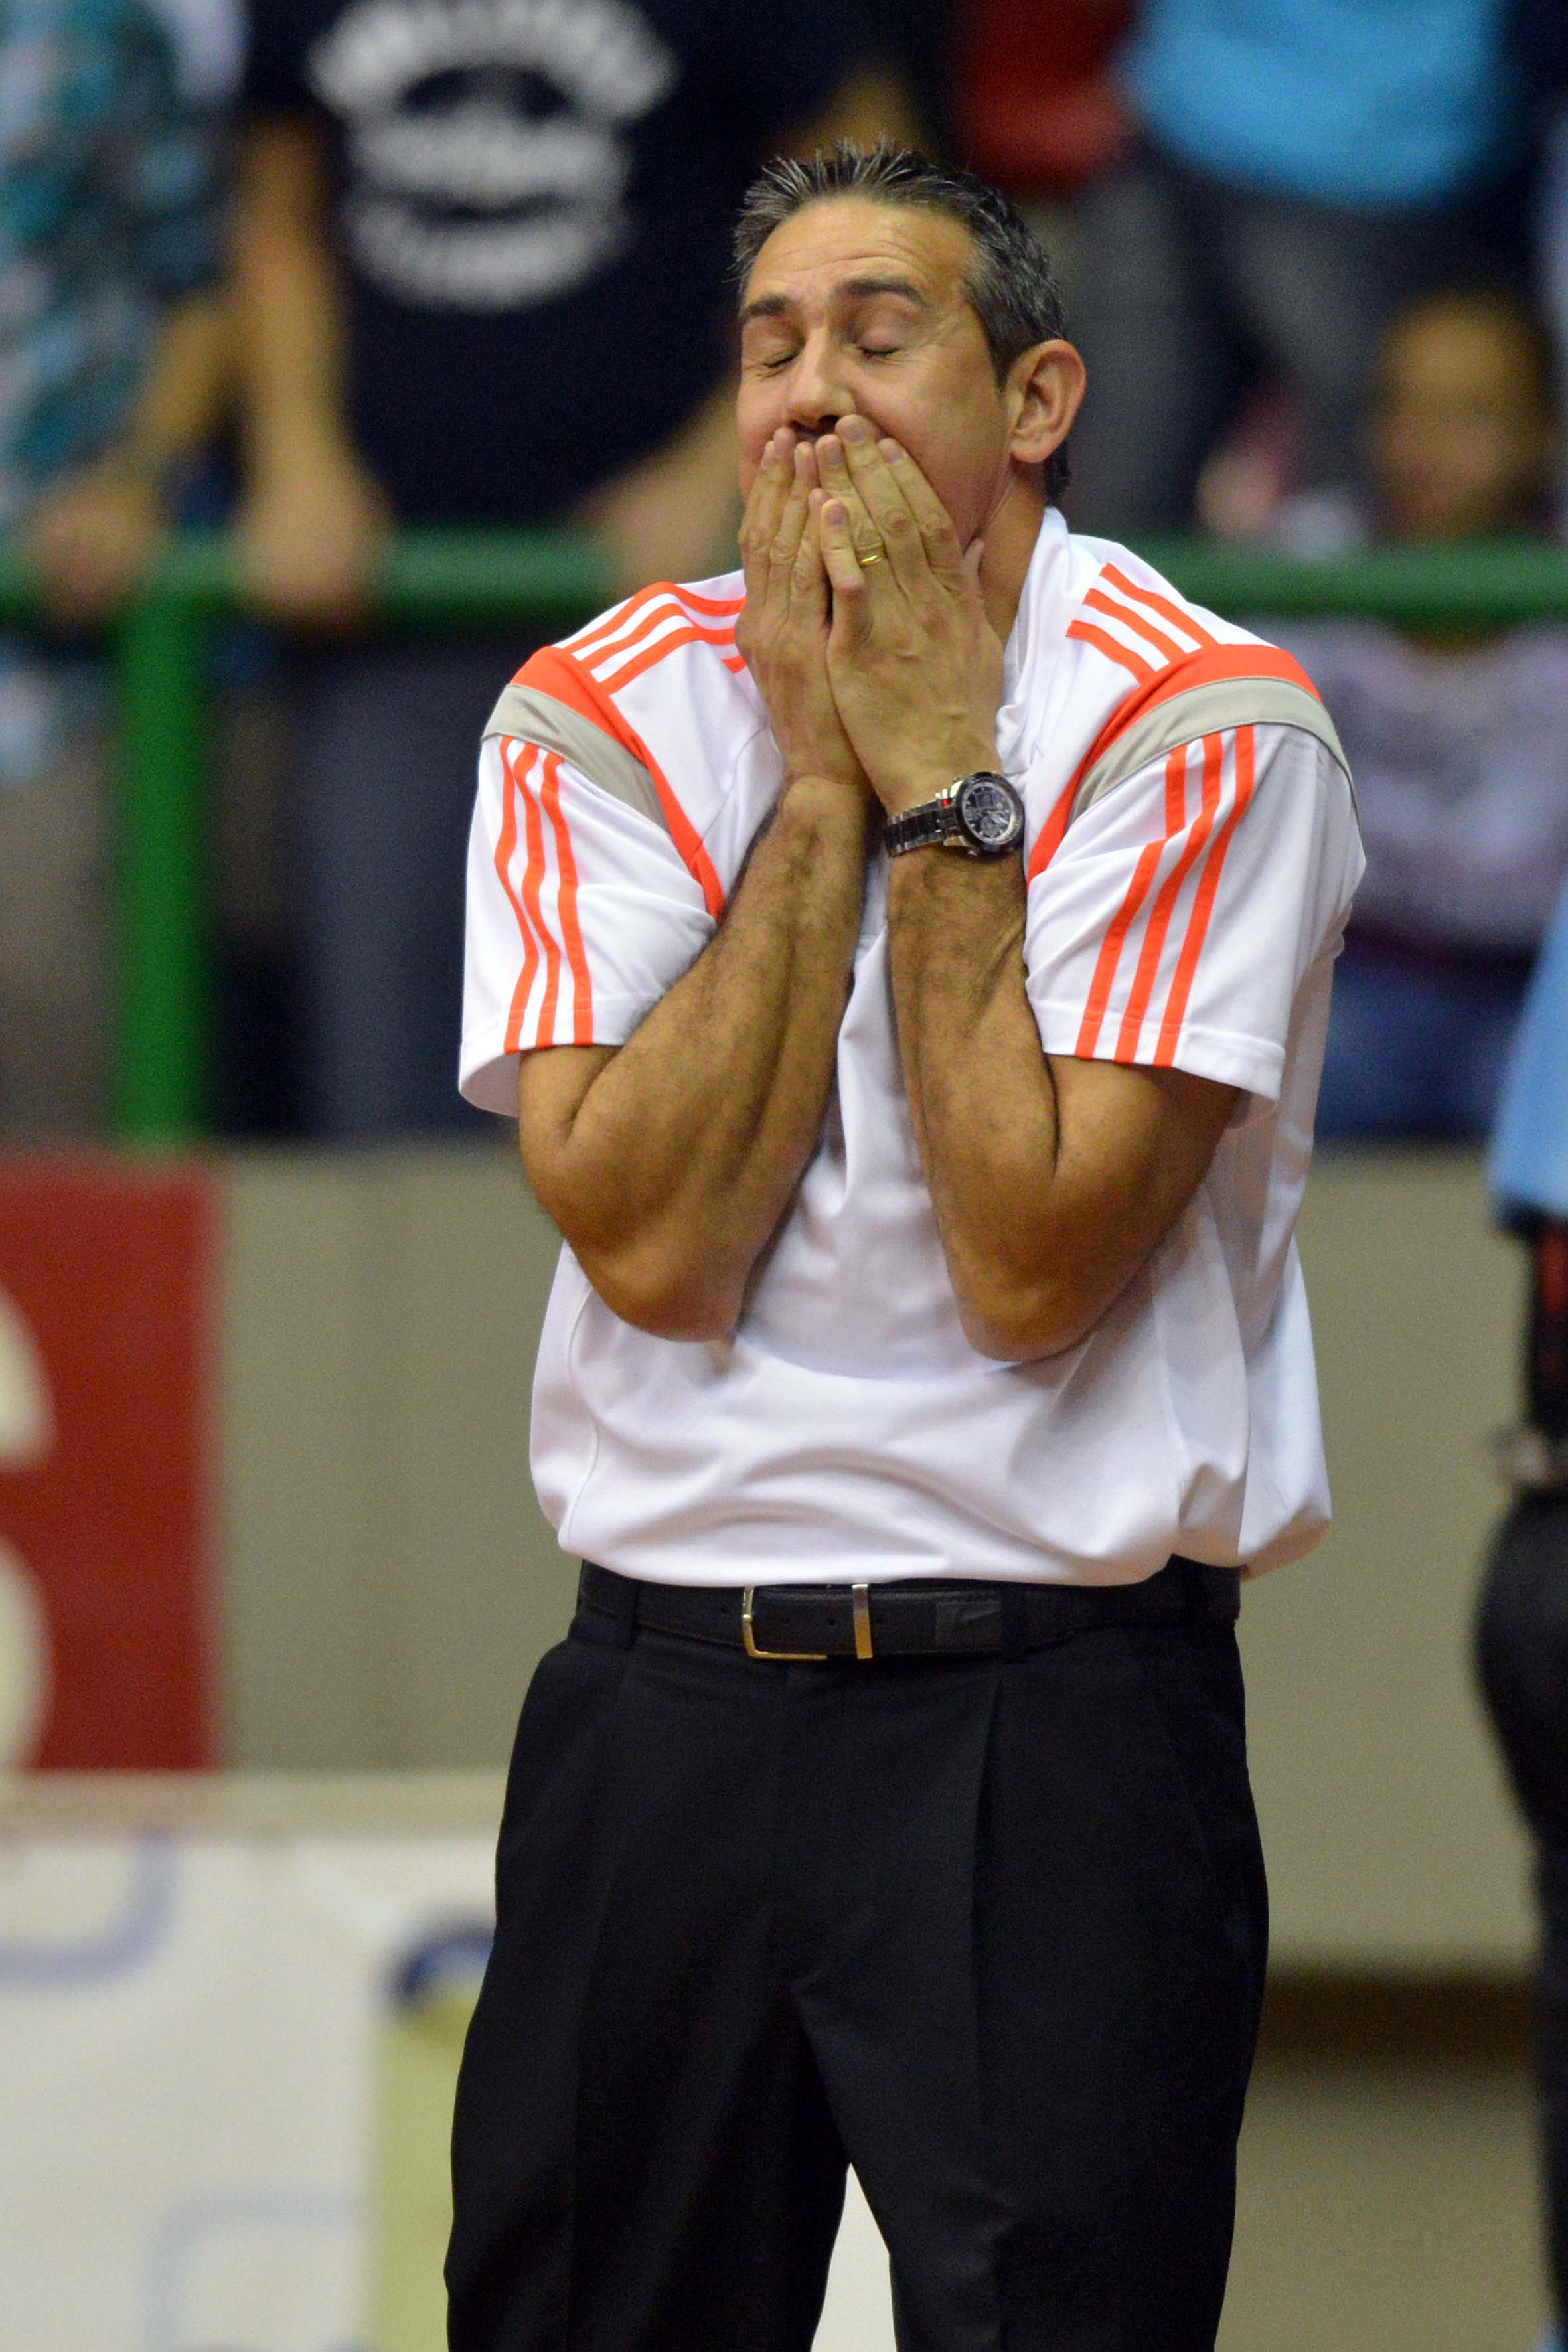 Técnico José Neto, do Flamengo